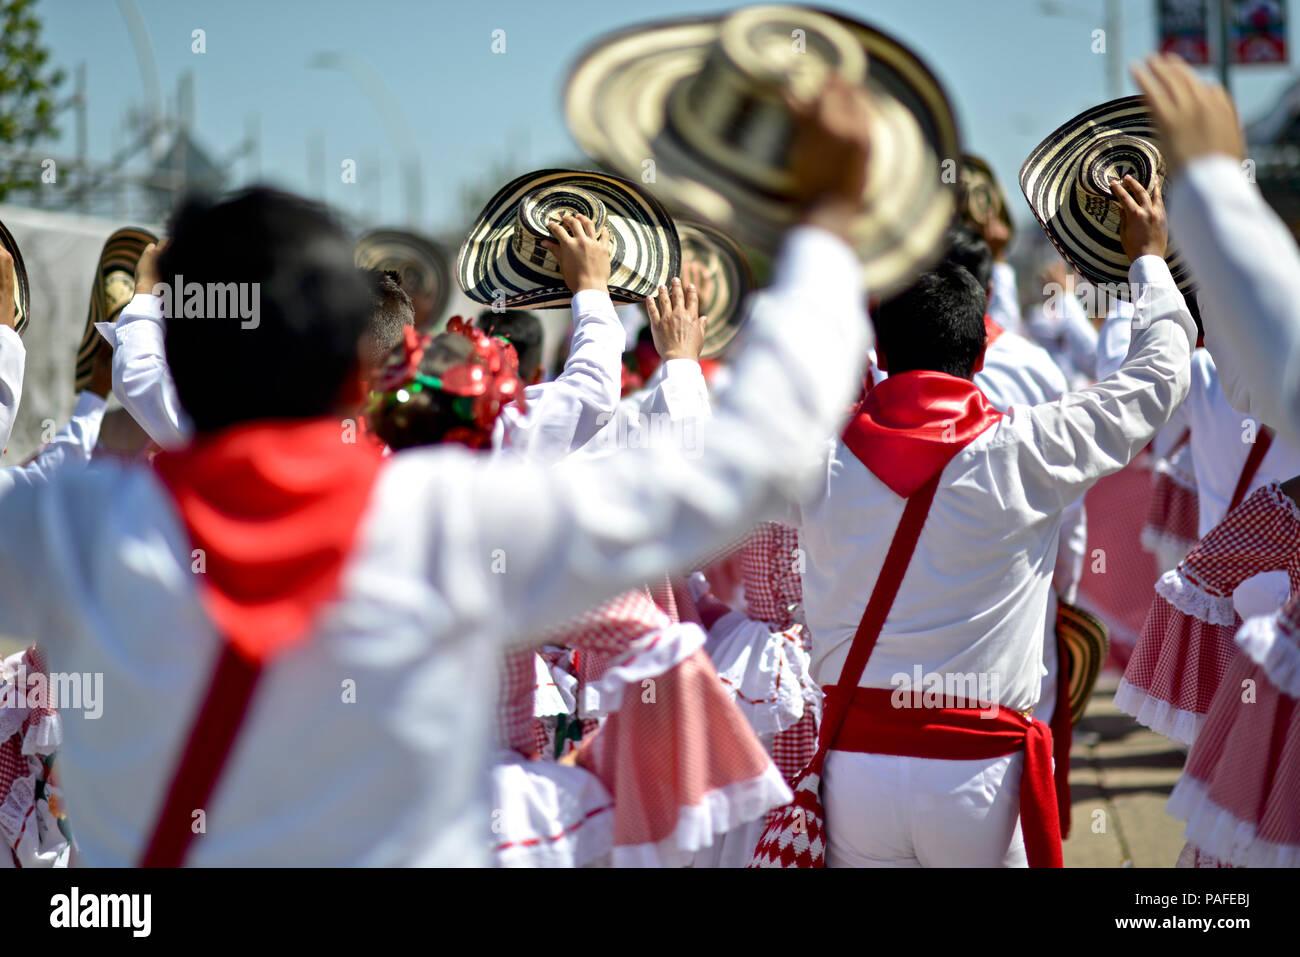 Battle of Flowers, Barranquilla Carnaval. Stock Photo